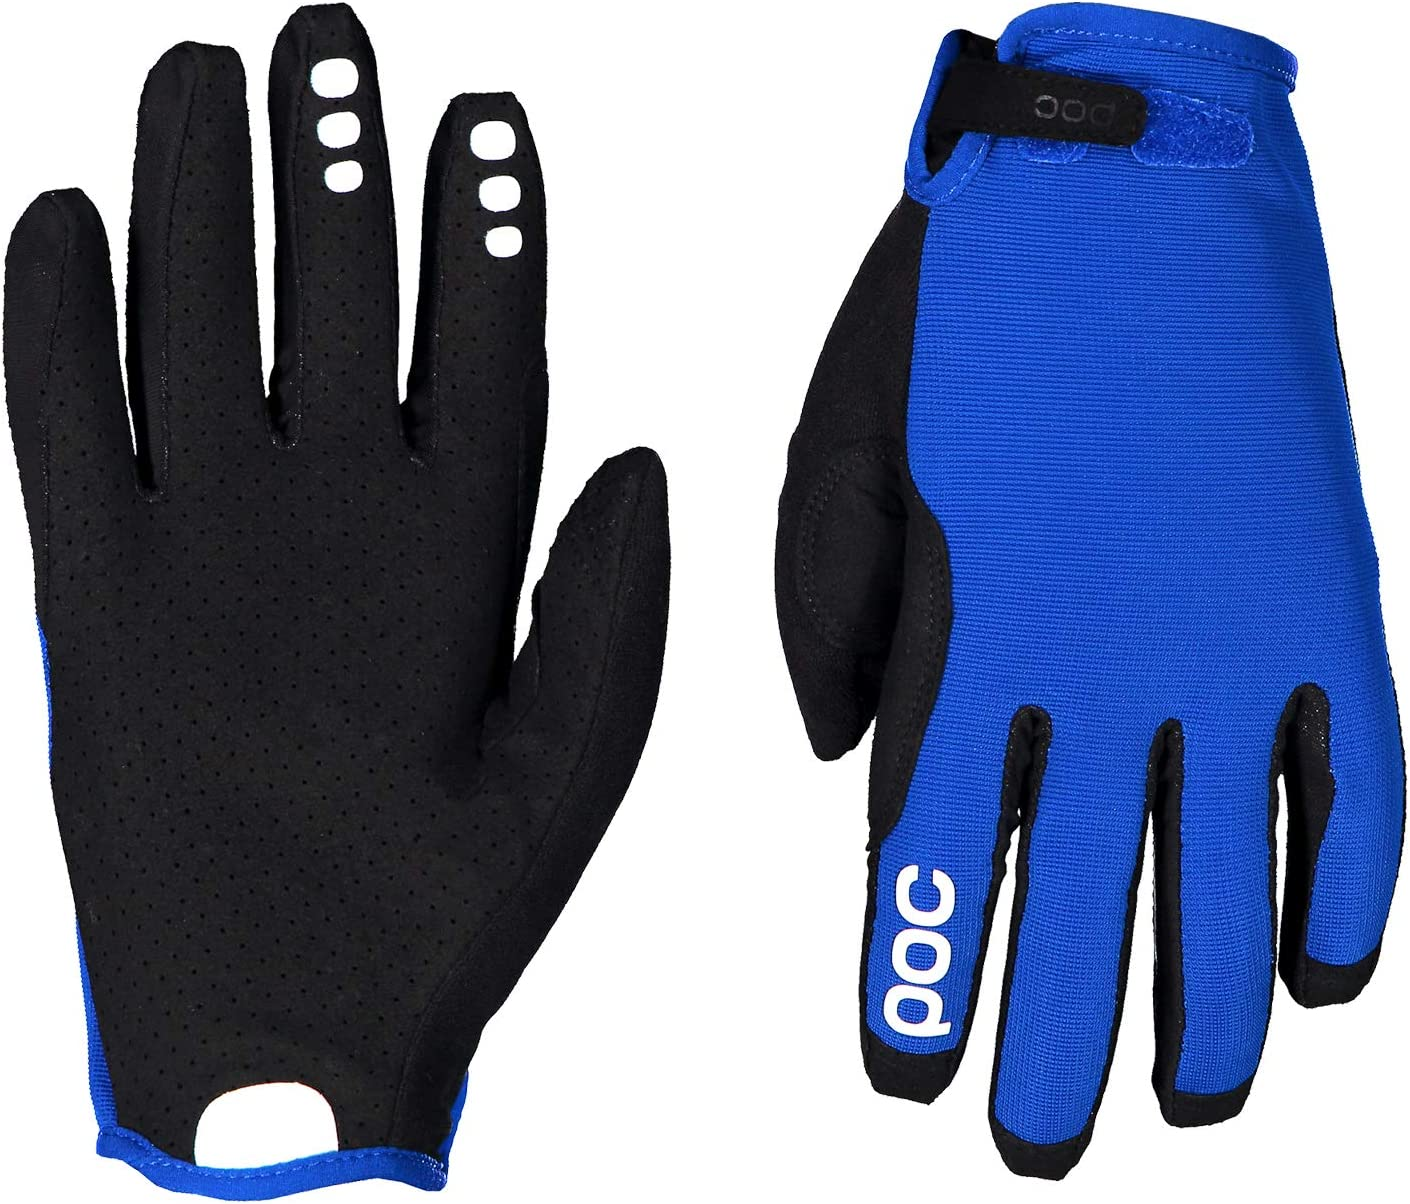 Mountain Biking Gloves Resistance Enduro Adjustable Glove POC